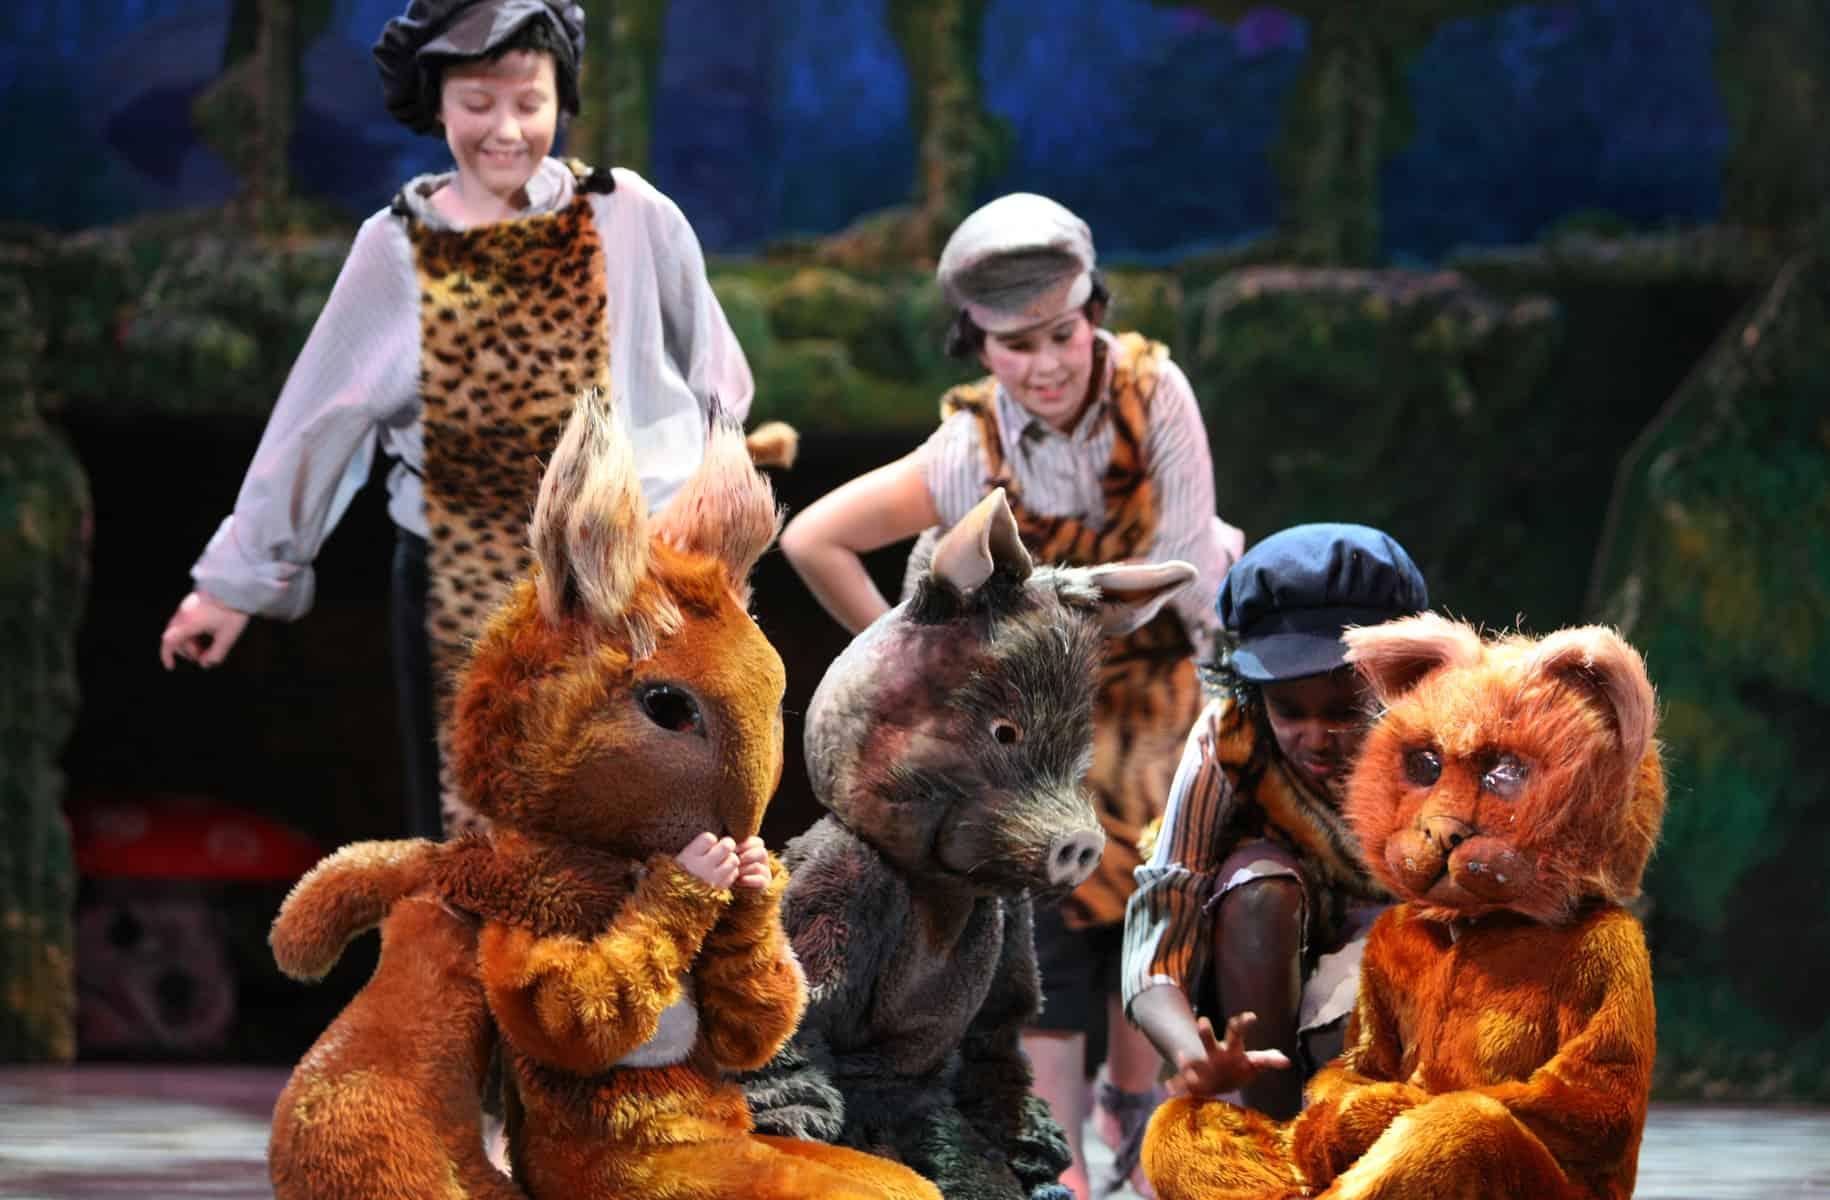 Peter Pan at Malvern Theatres children and animals